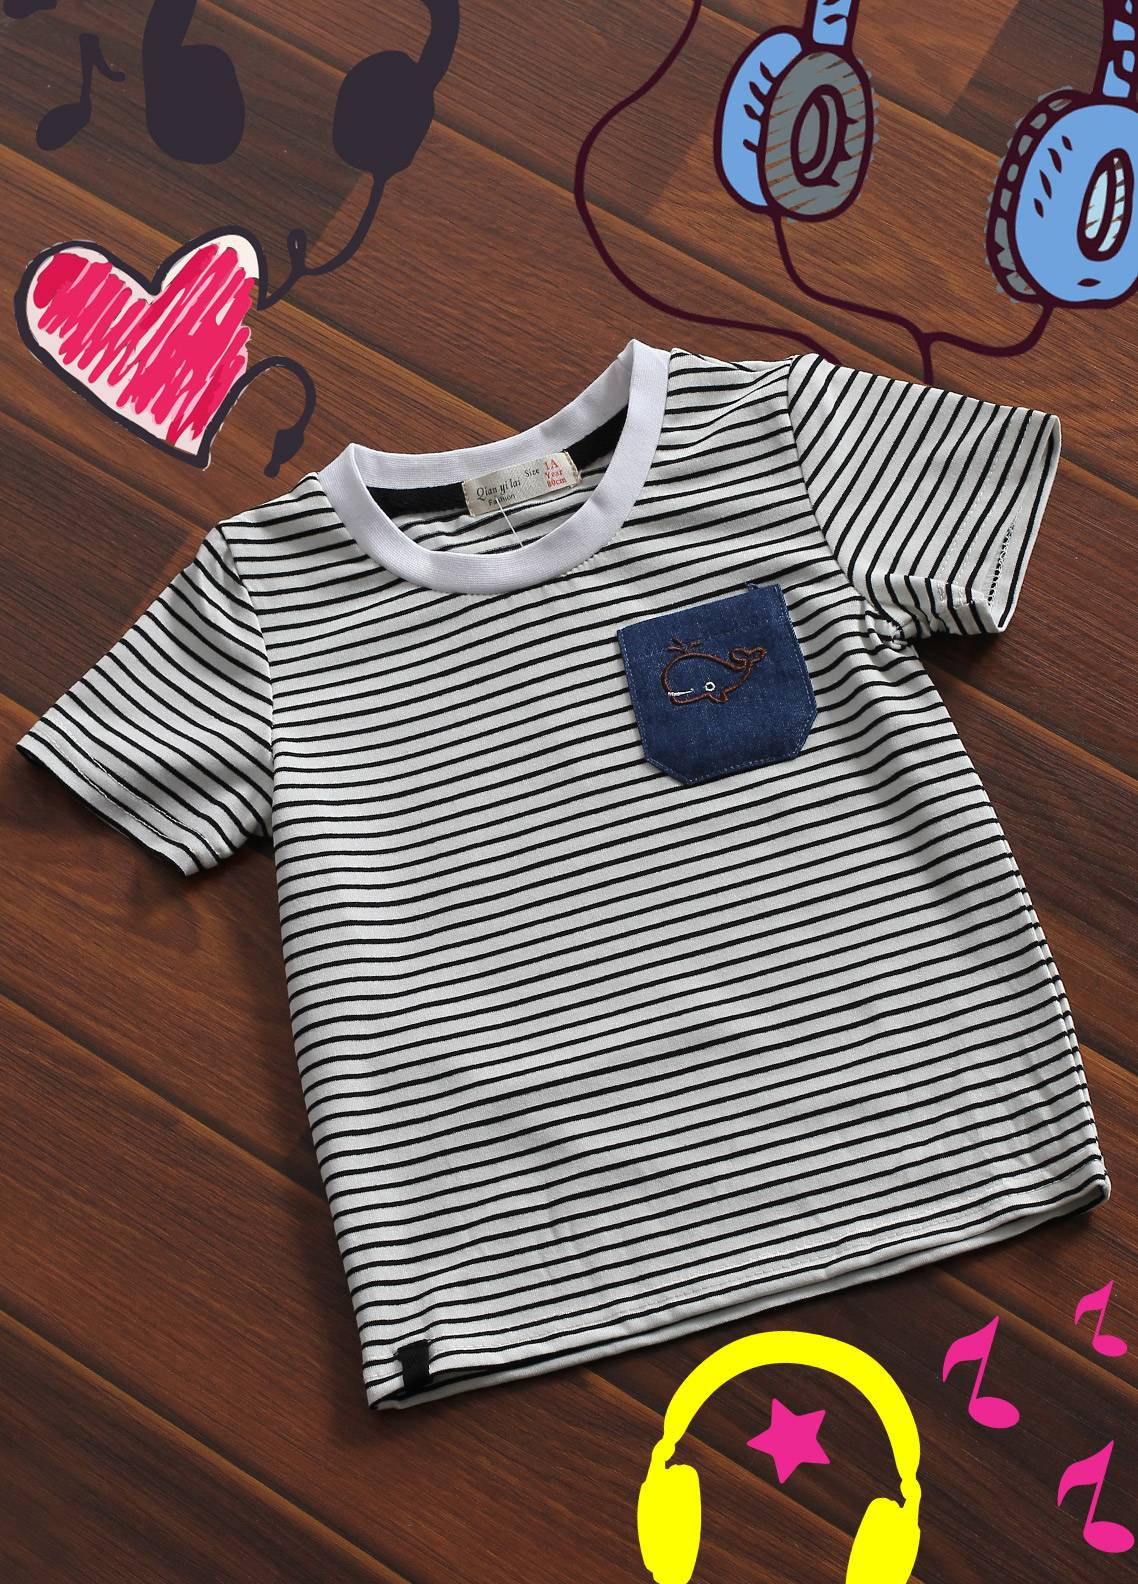 Sanaulla Exclusive Range Cotton Printed Boys T-Shirts -  32 Off-White